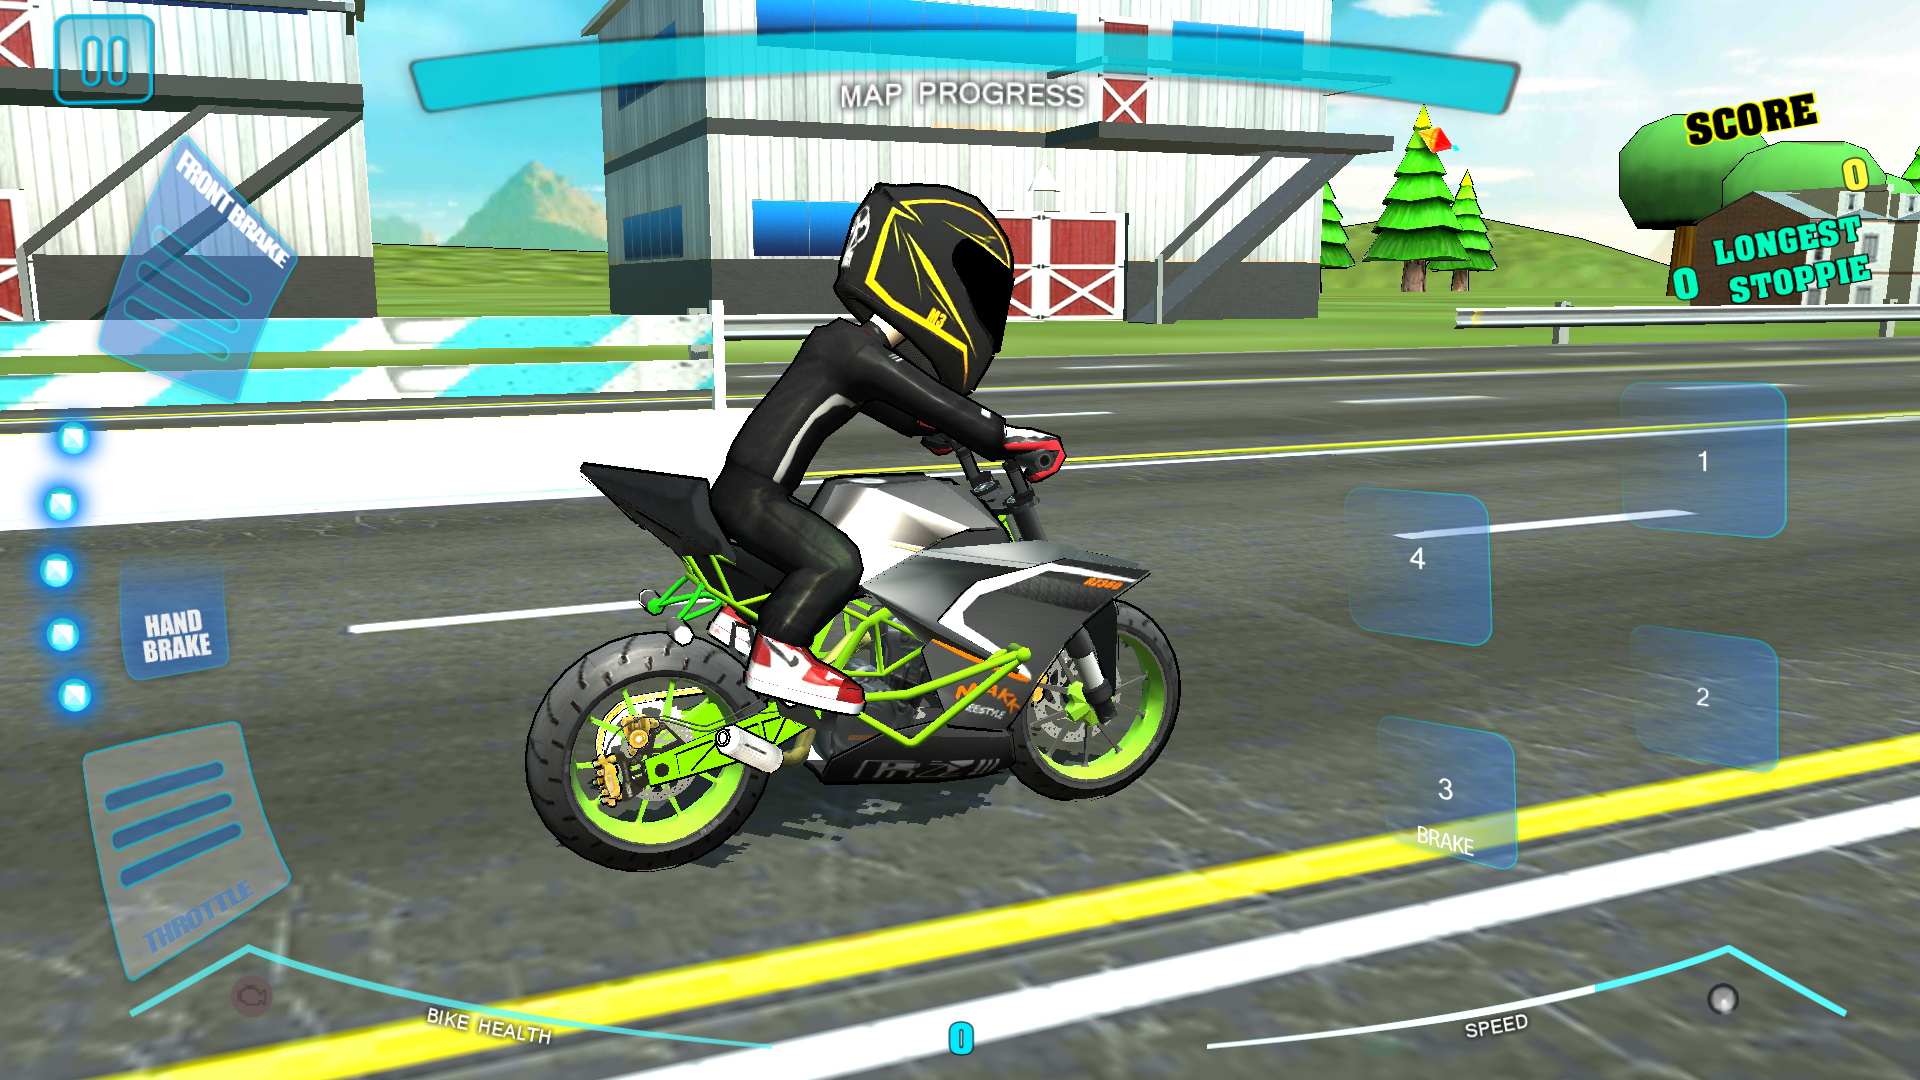 игра гонка на мотоциклах по городу